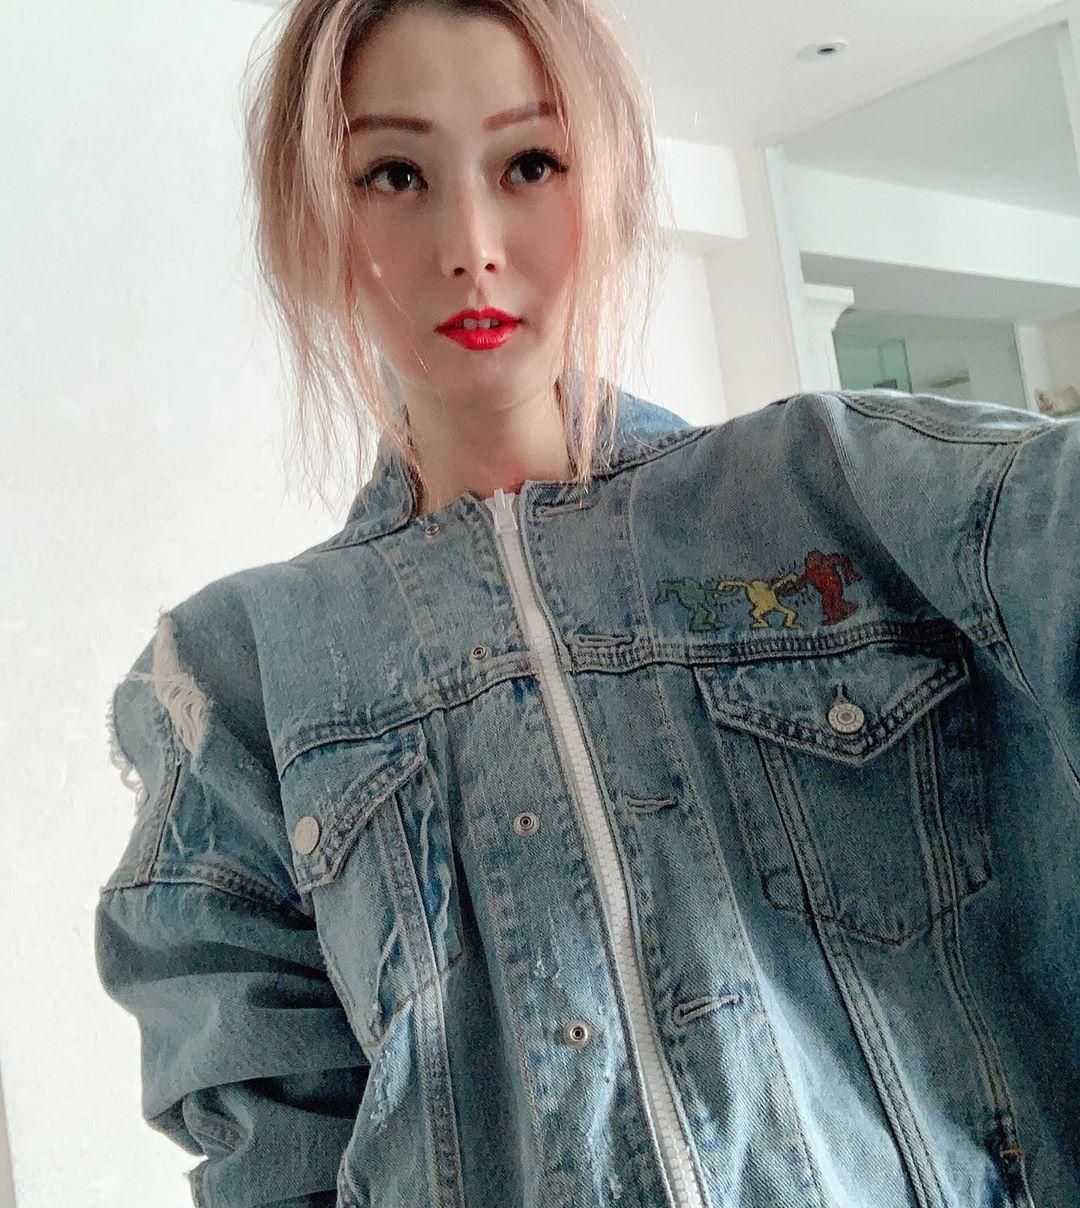 Hong Kong singer Sammi Cheng is having her hands full taking care of her ageing parents. — Picture via Instagram/ sammi_chengsauman